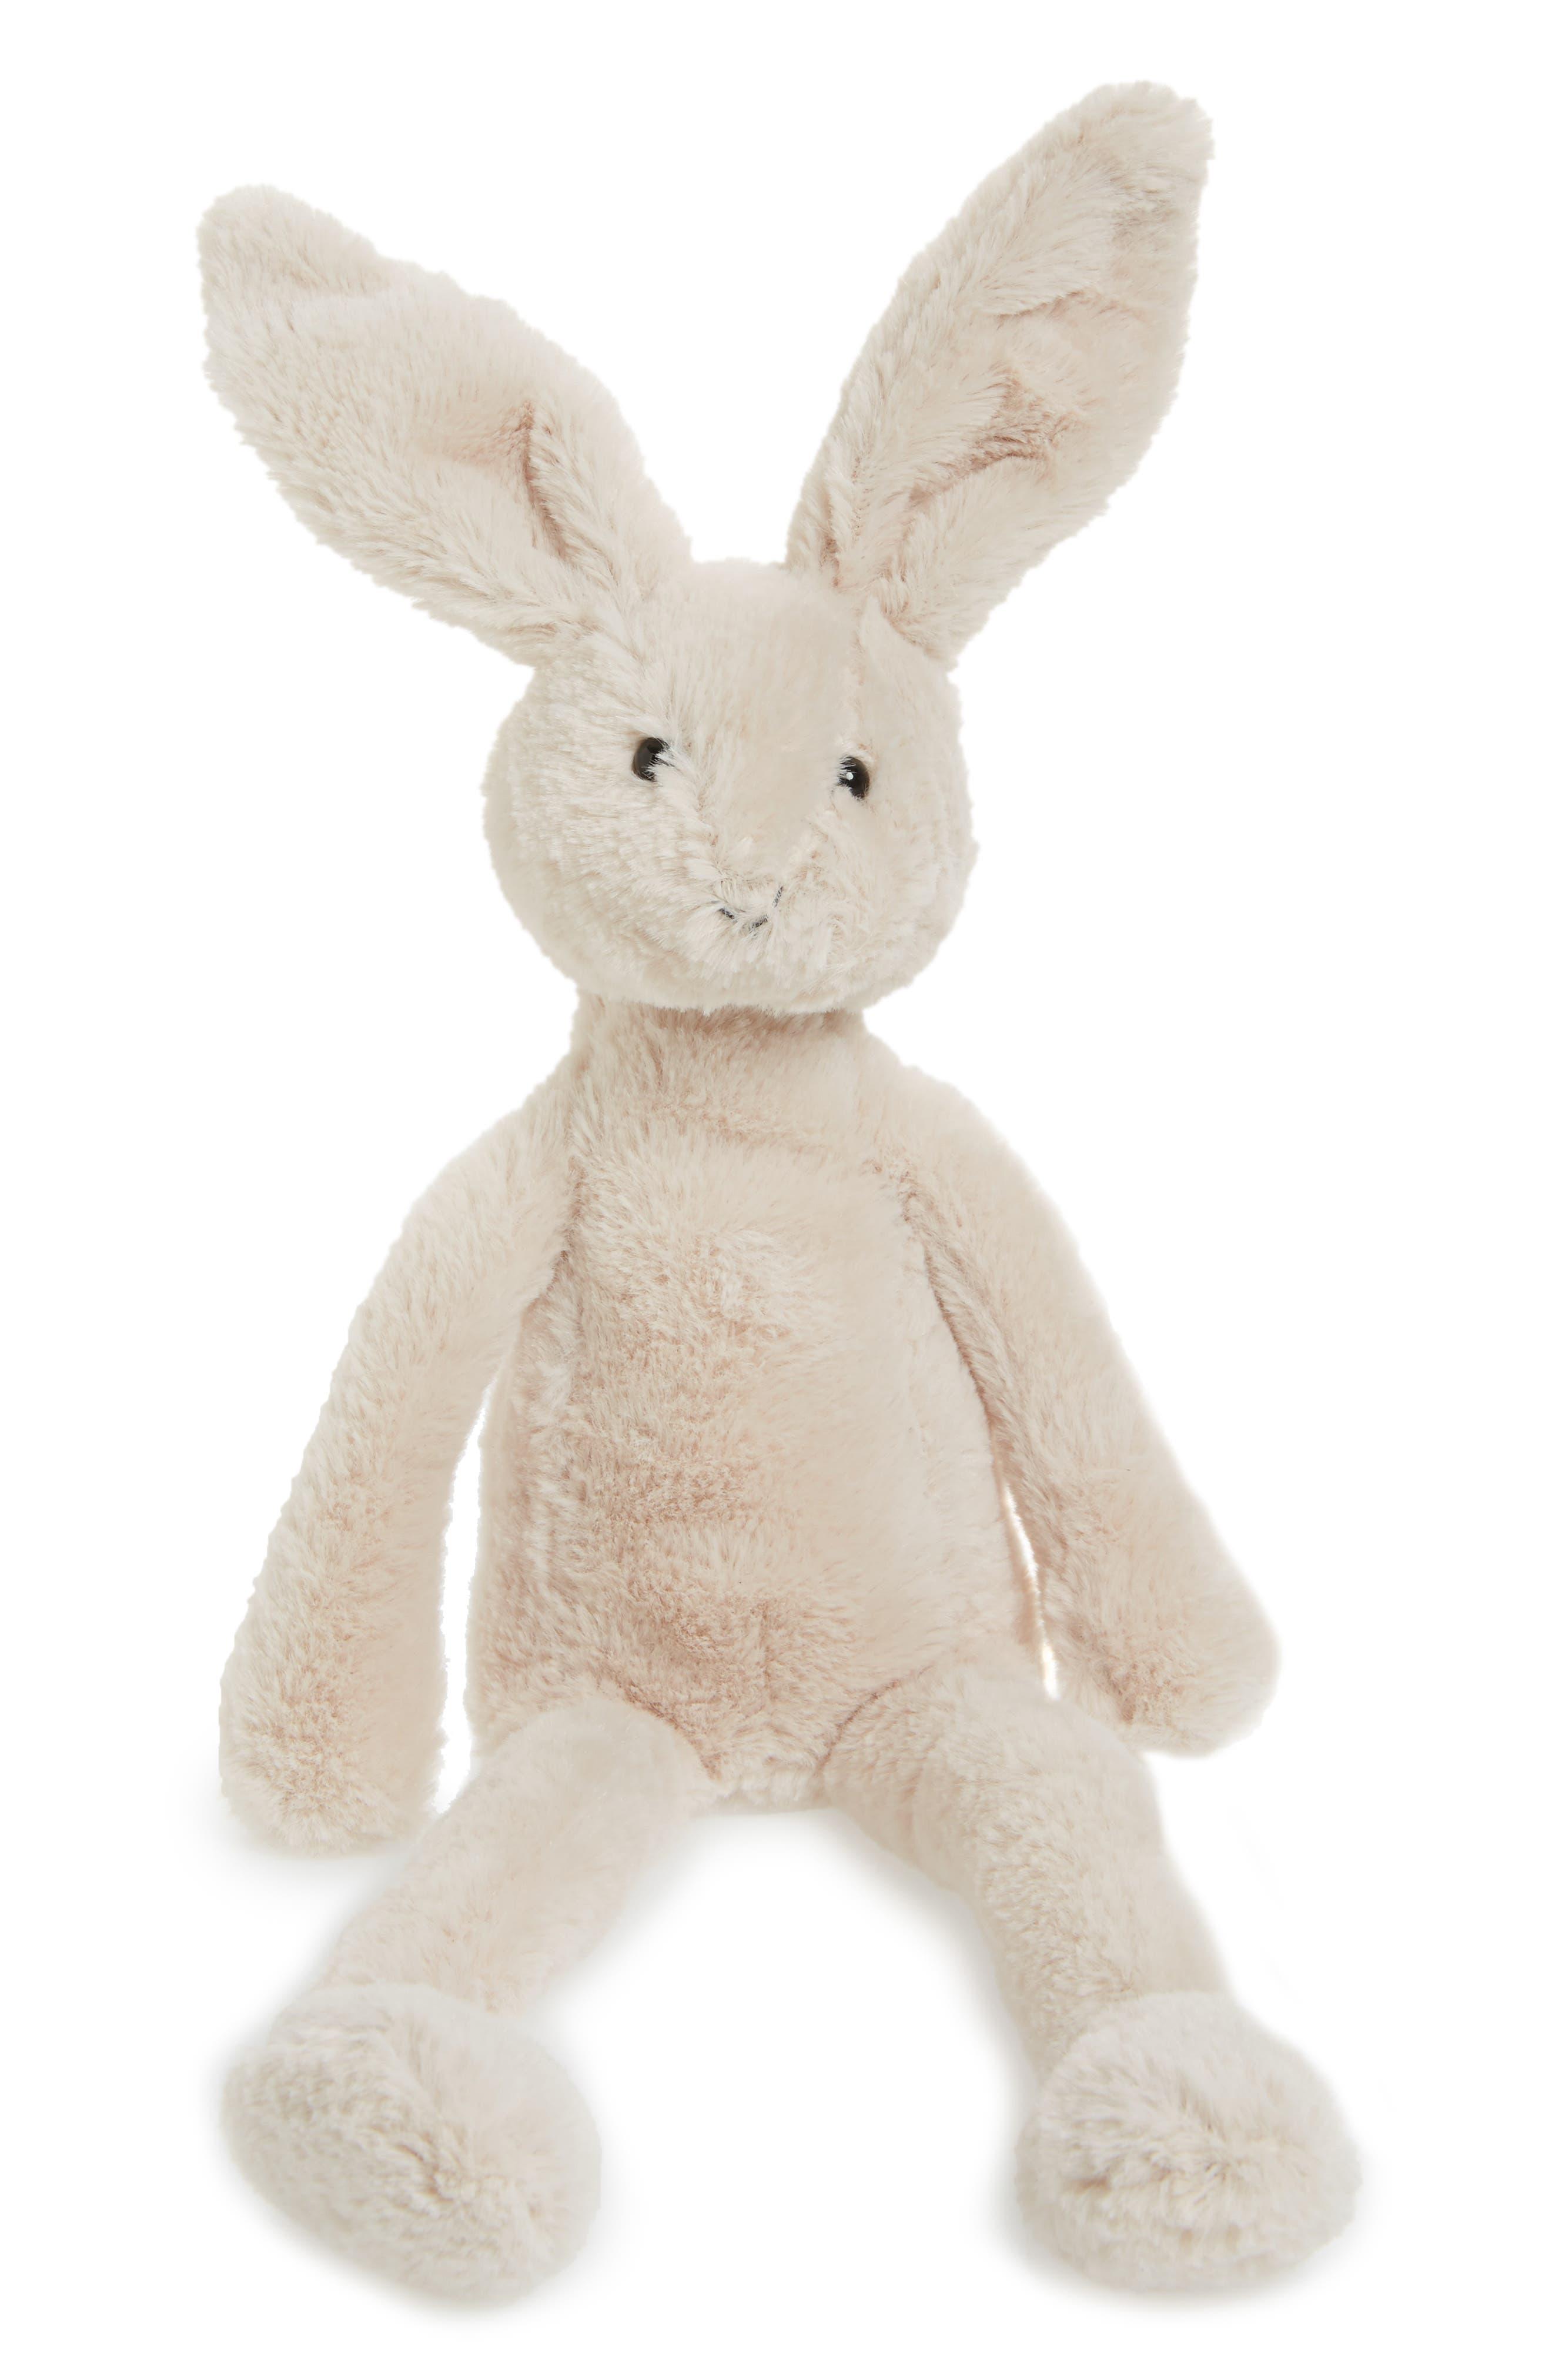 Pitterpat Bunny Stuffed Animal,                             Main thumbnail 1, color,                             Cream